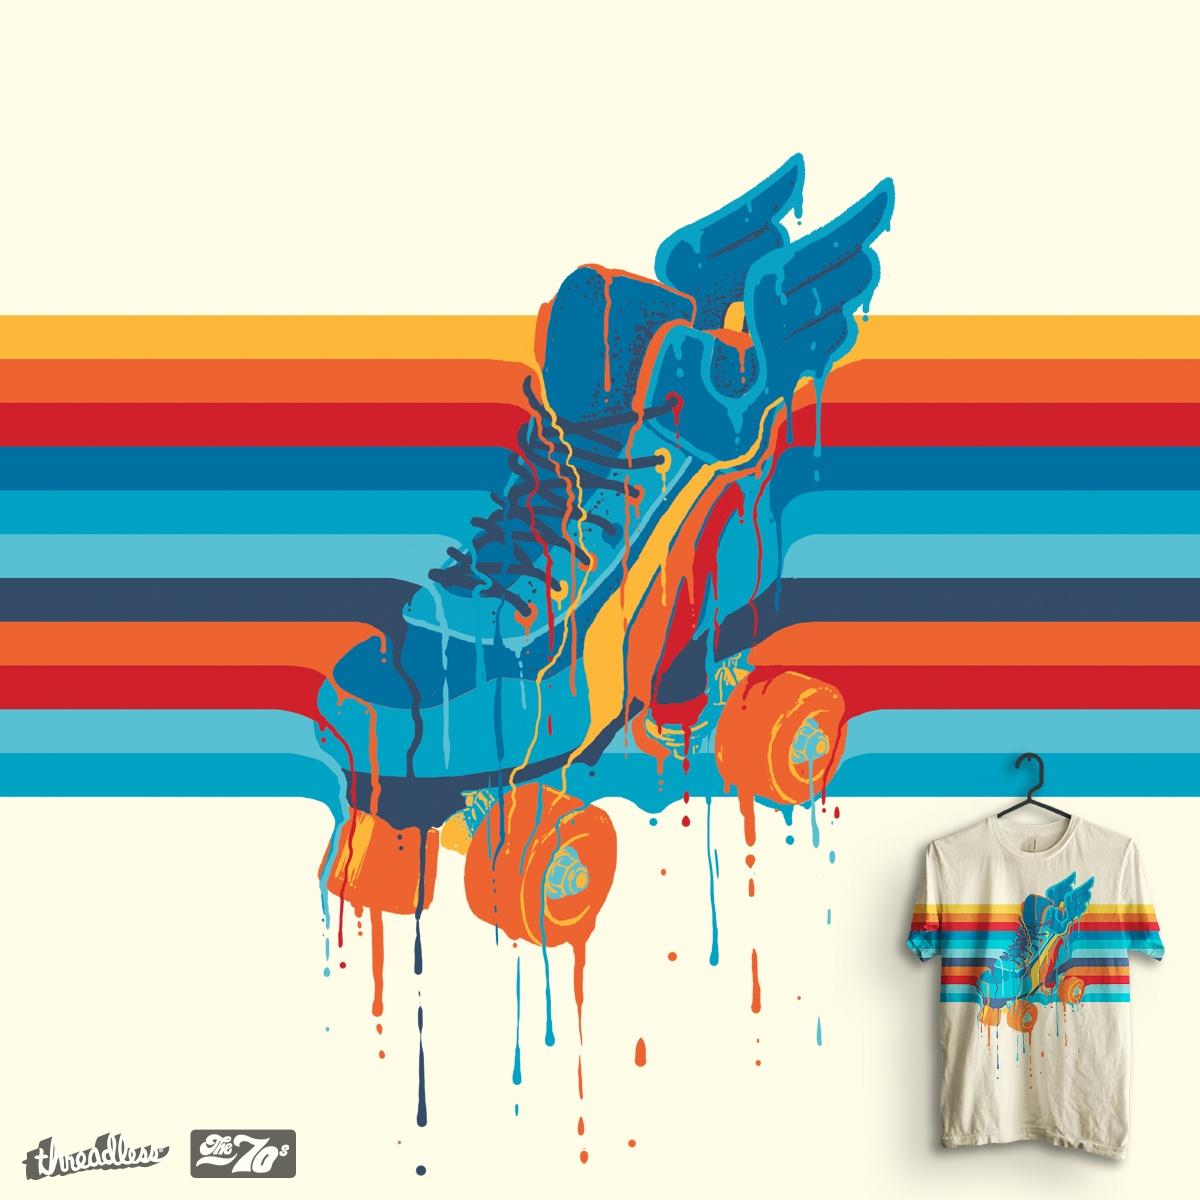 Roller Skate by idilek on Threadless